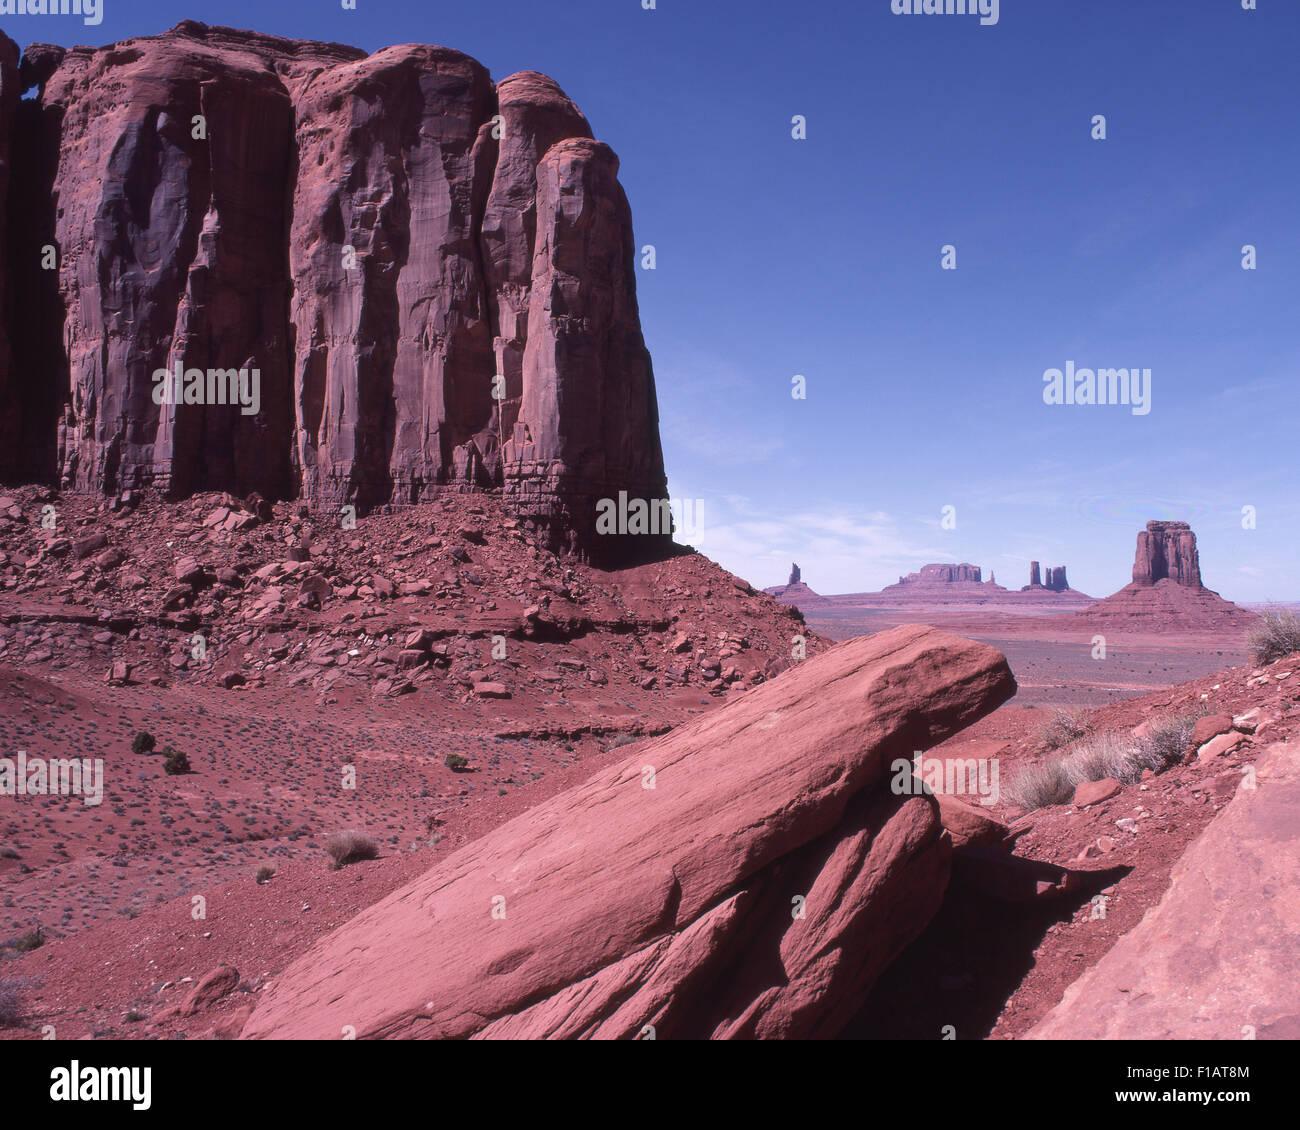 Monument Valley Navajo Tribal Park - Stock Image